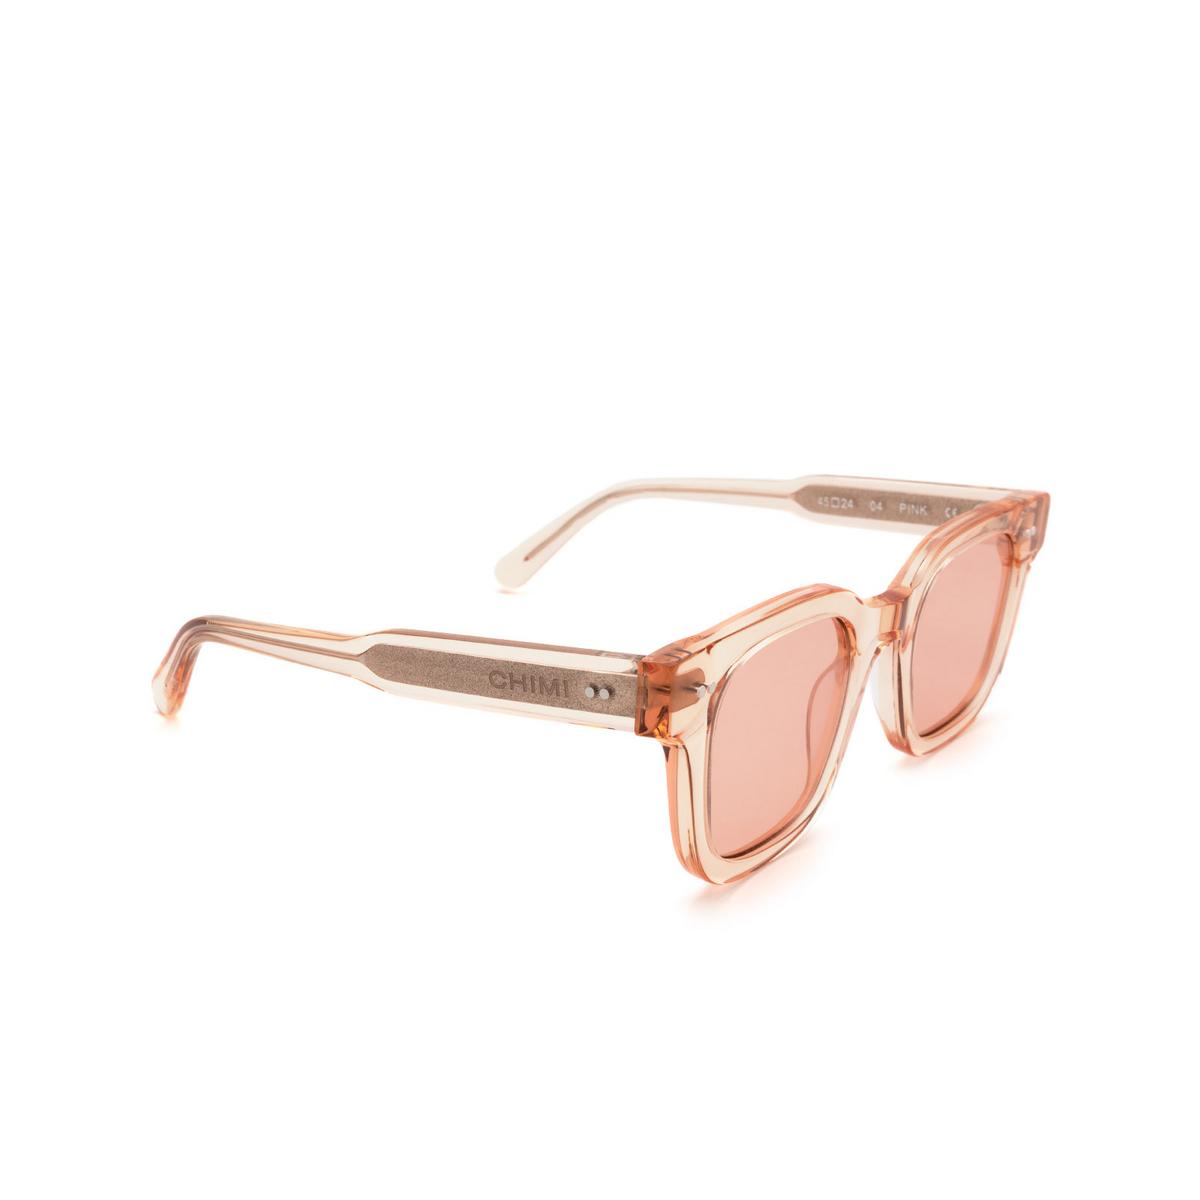 Chimi® Square Sunglasses: 04 color Pink - three-quarters view.